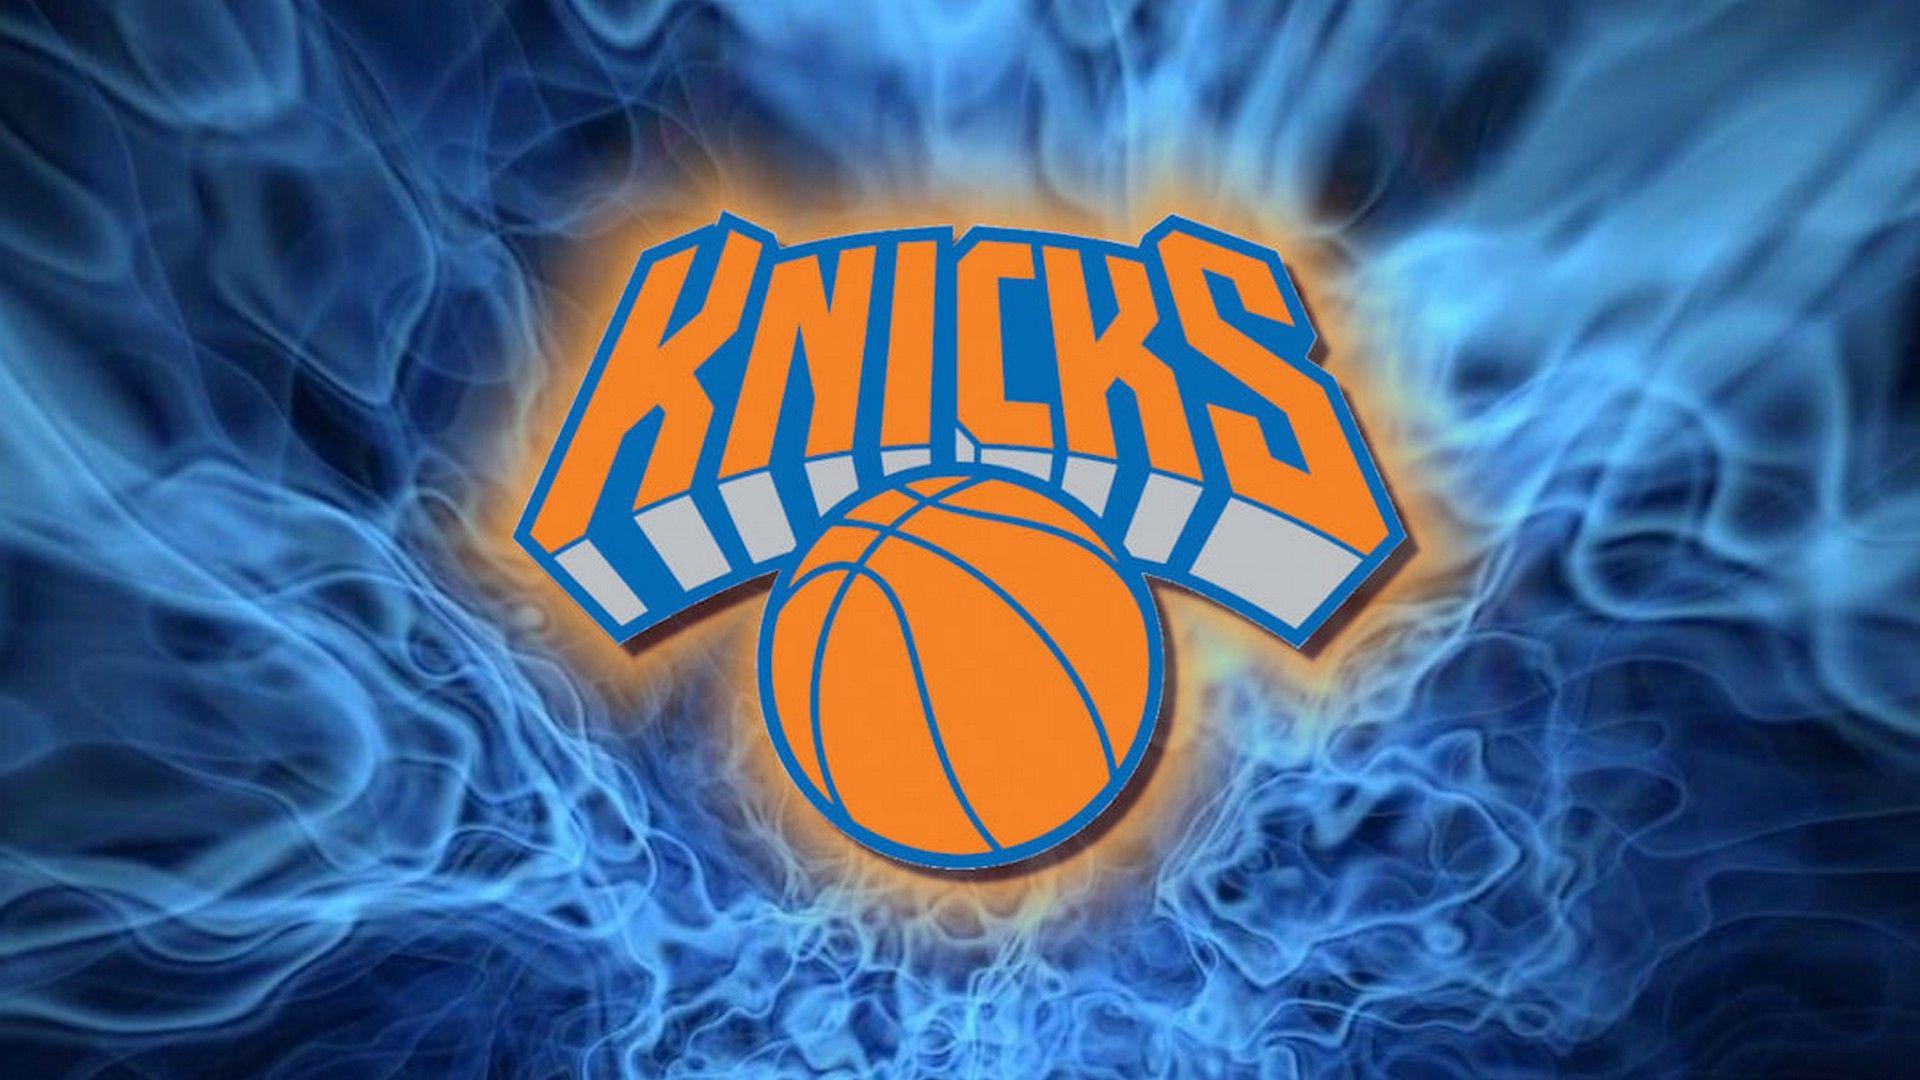 New York Knicks wallpaper photo